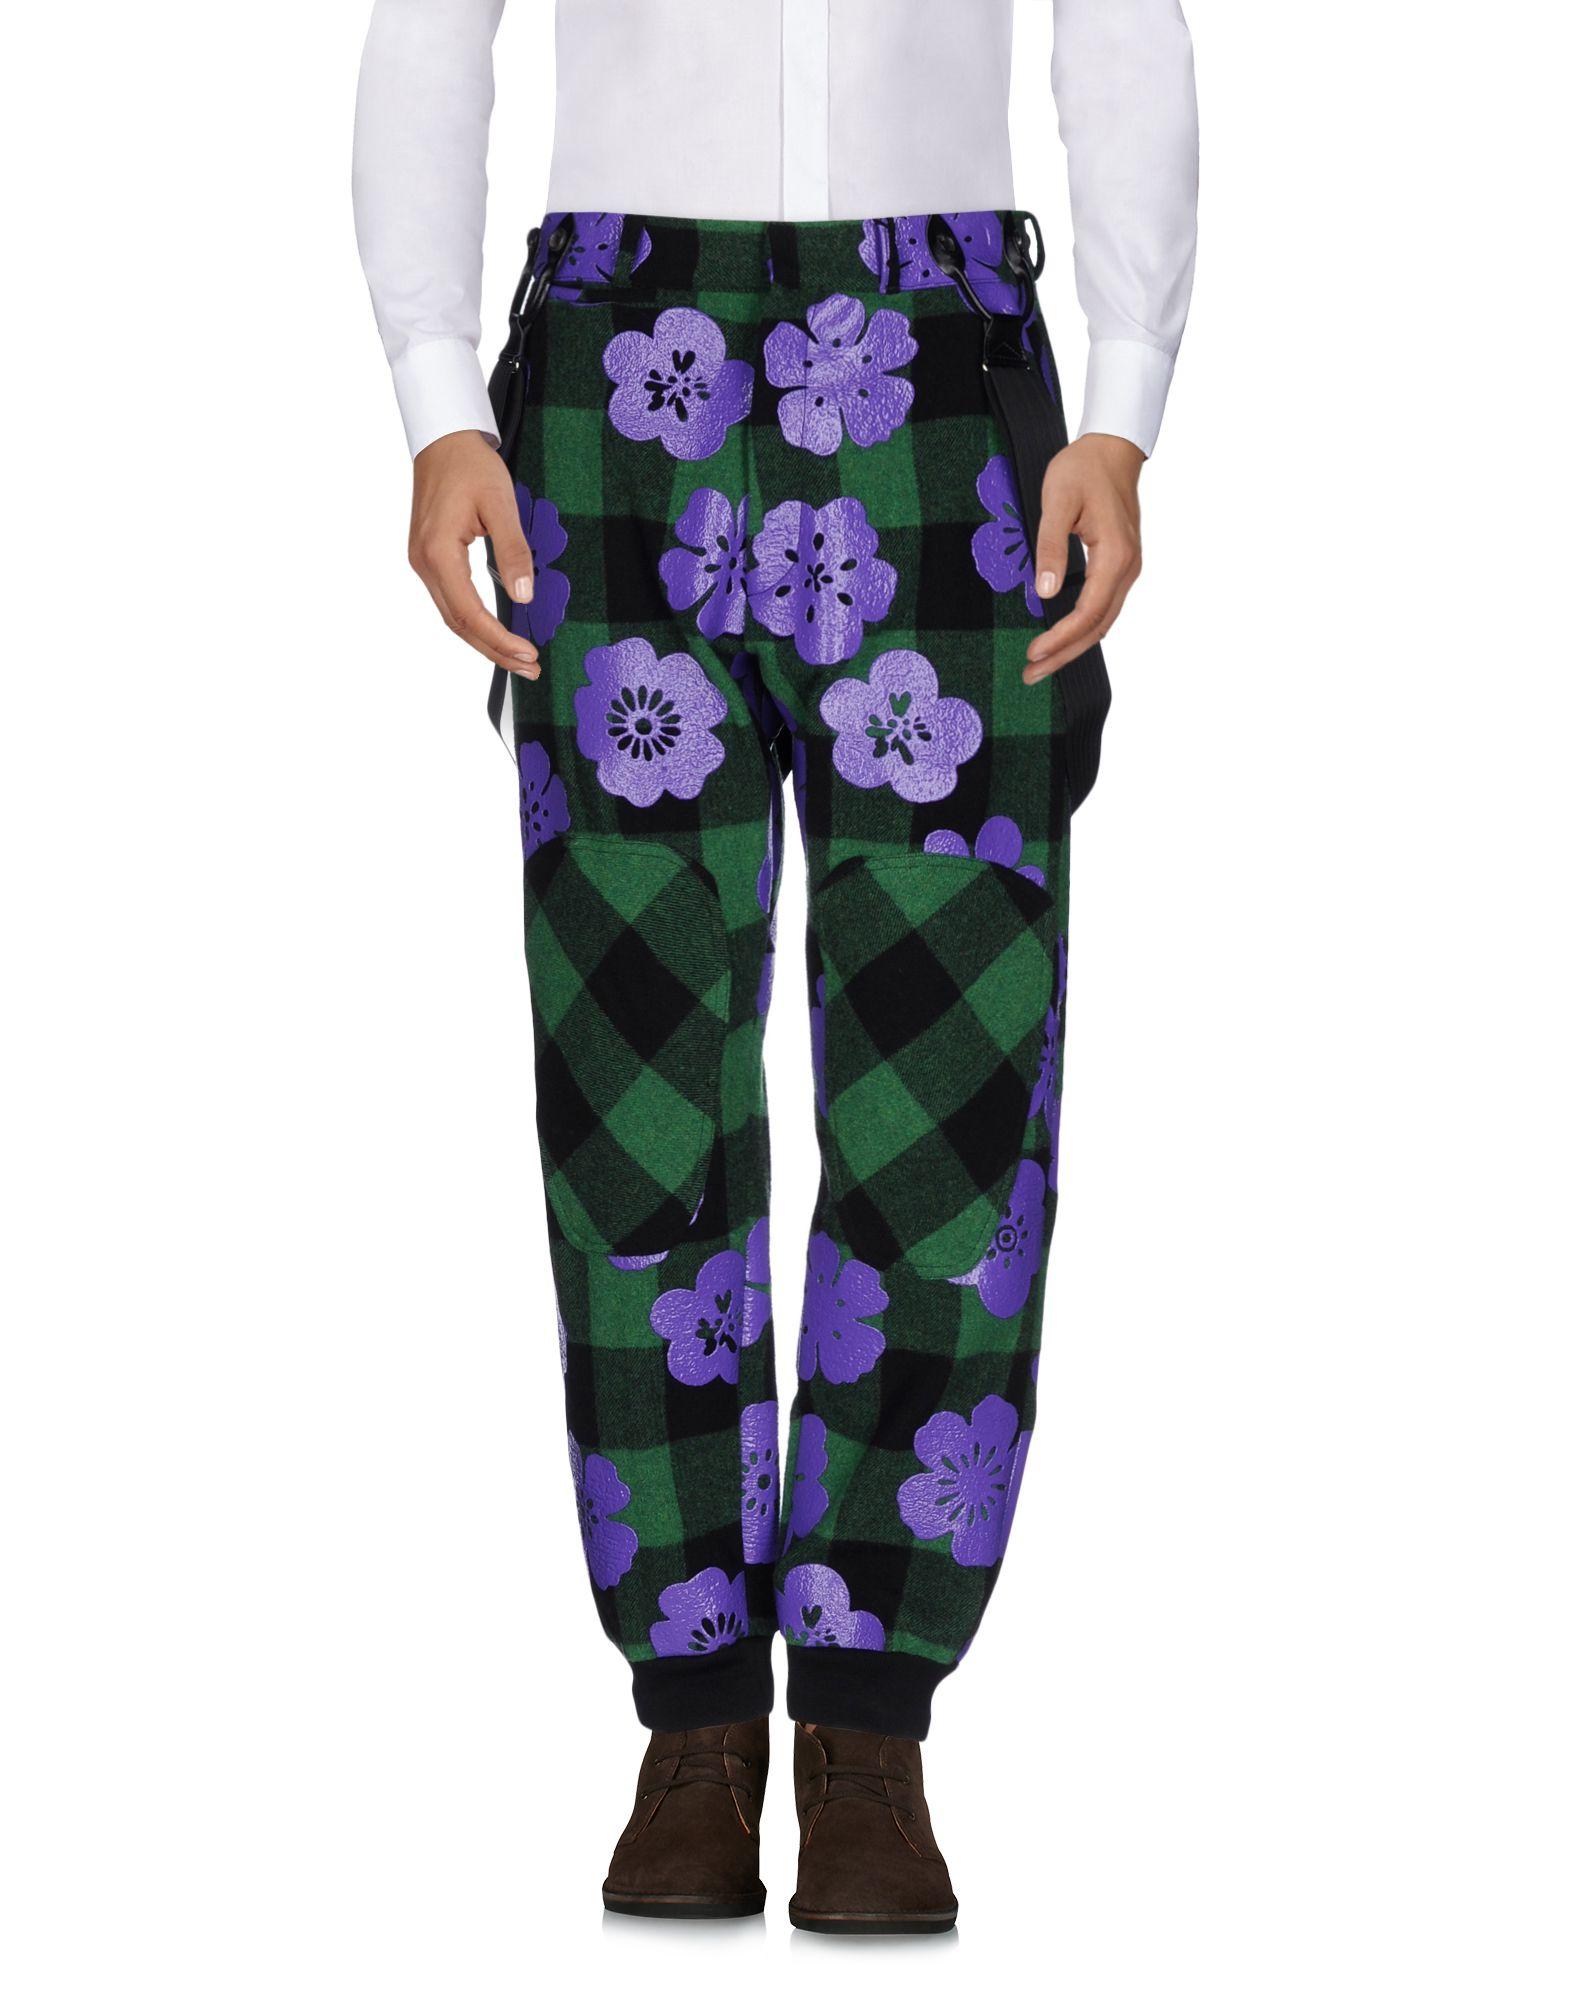 Pantalone Moschino Uomo - Acquista online su